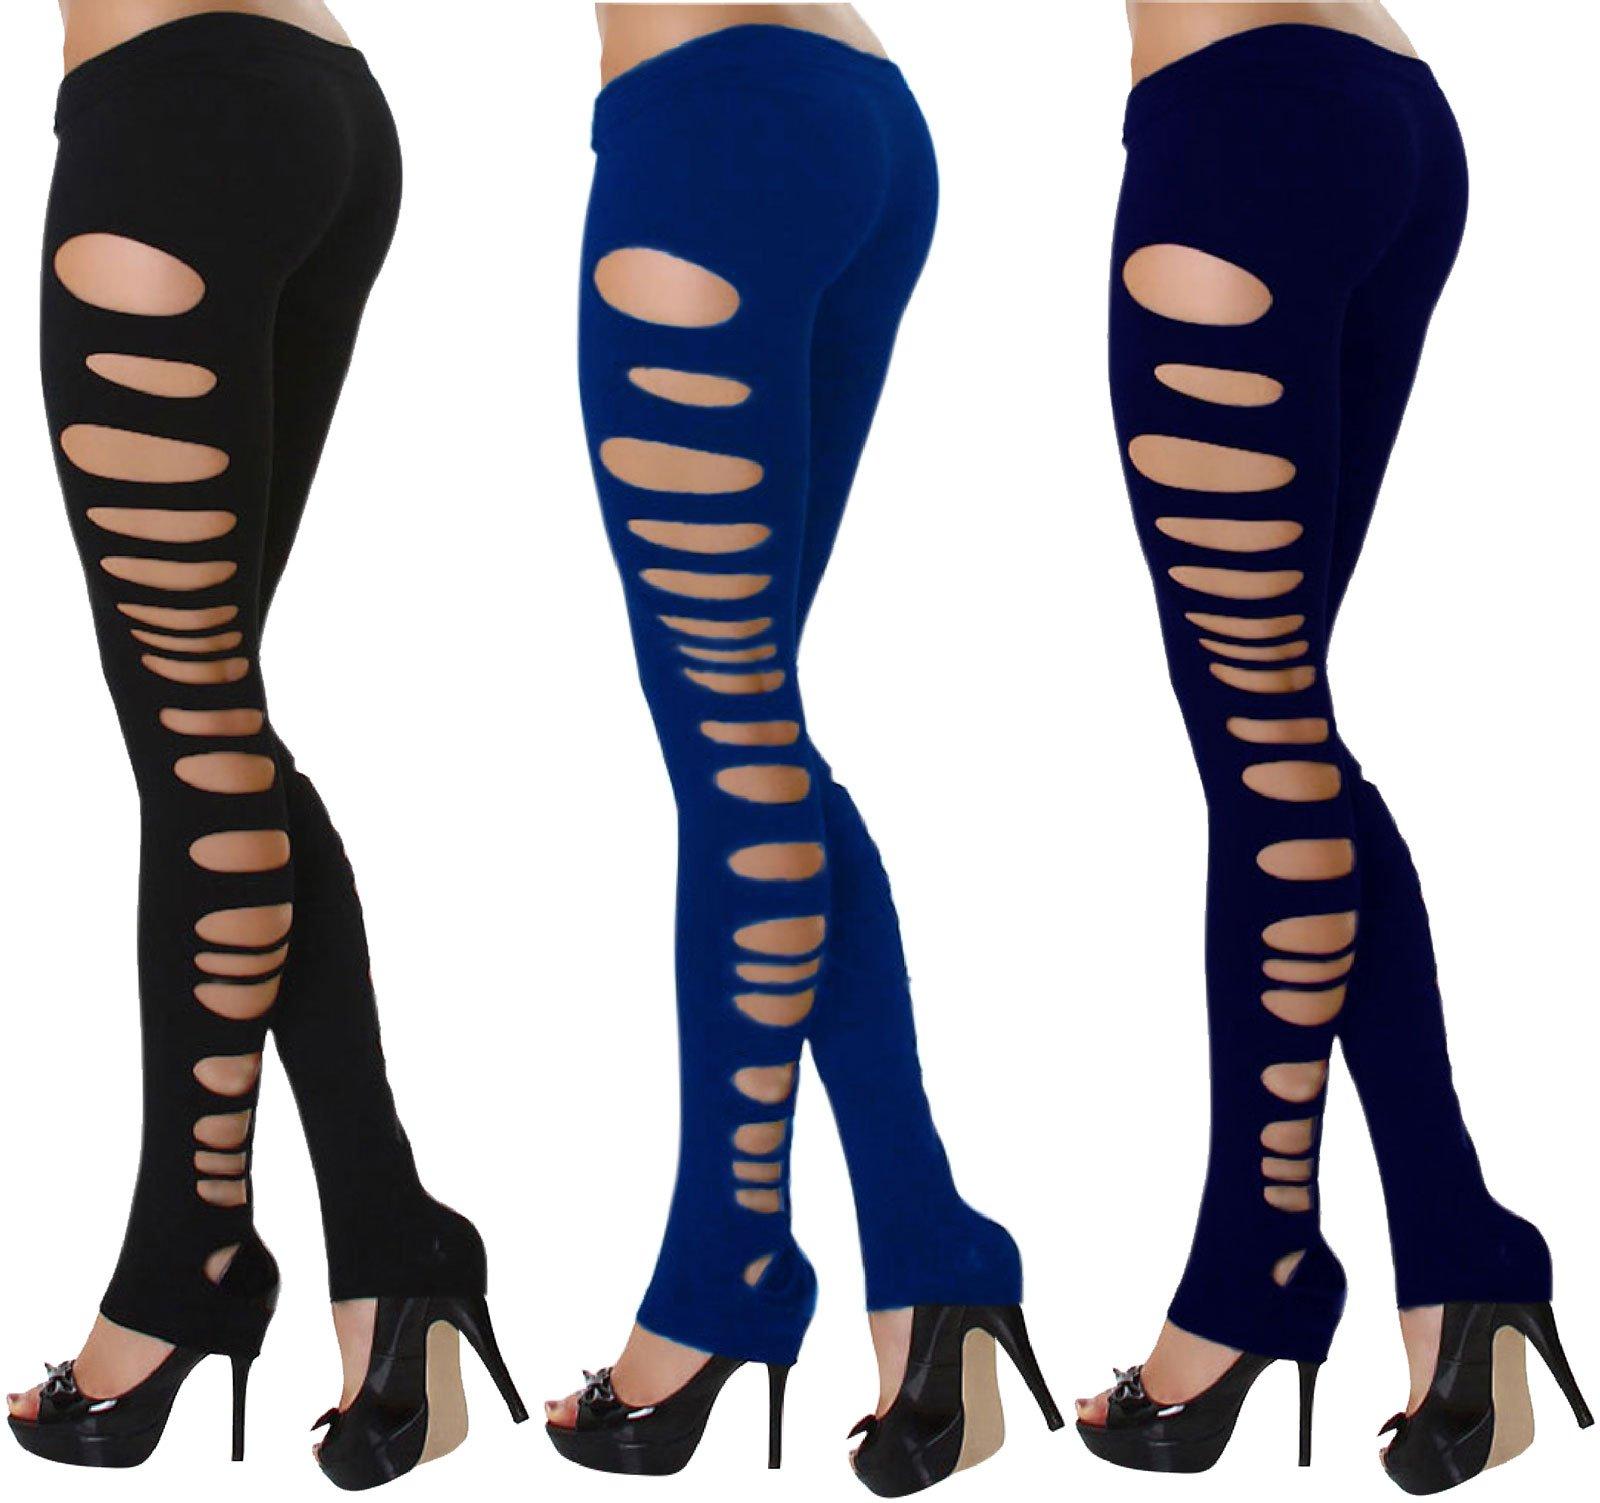 J.Ann Women's 6-Pack Fashion Sides Ripped Footless (2 Black, 2 Royal Blue, 2 Navy)